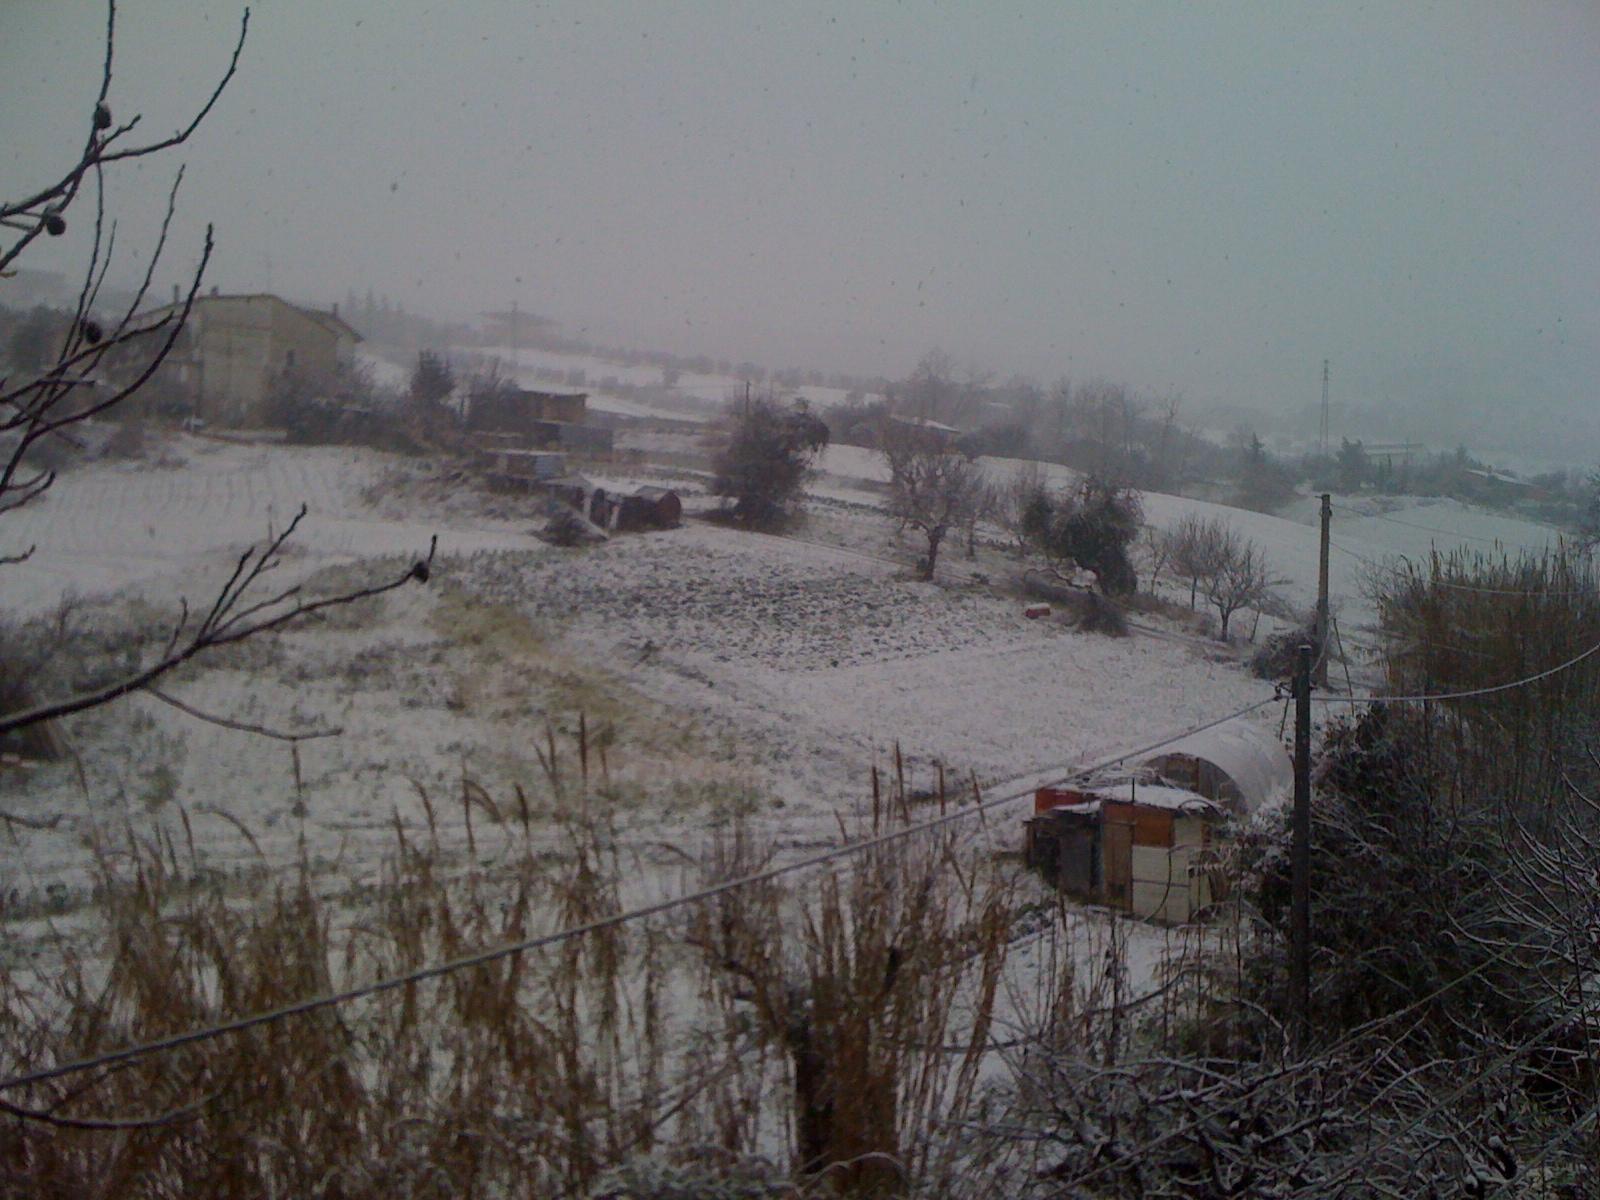 Neve a Ponterotto 3 febbraio 2012 (foto Lorenzo De Angelis)